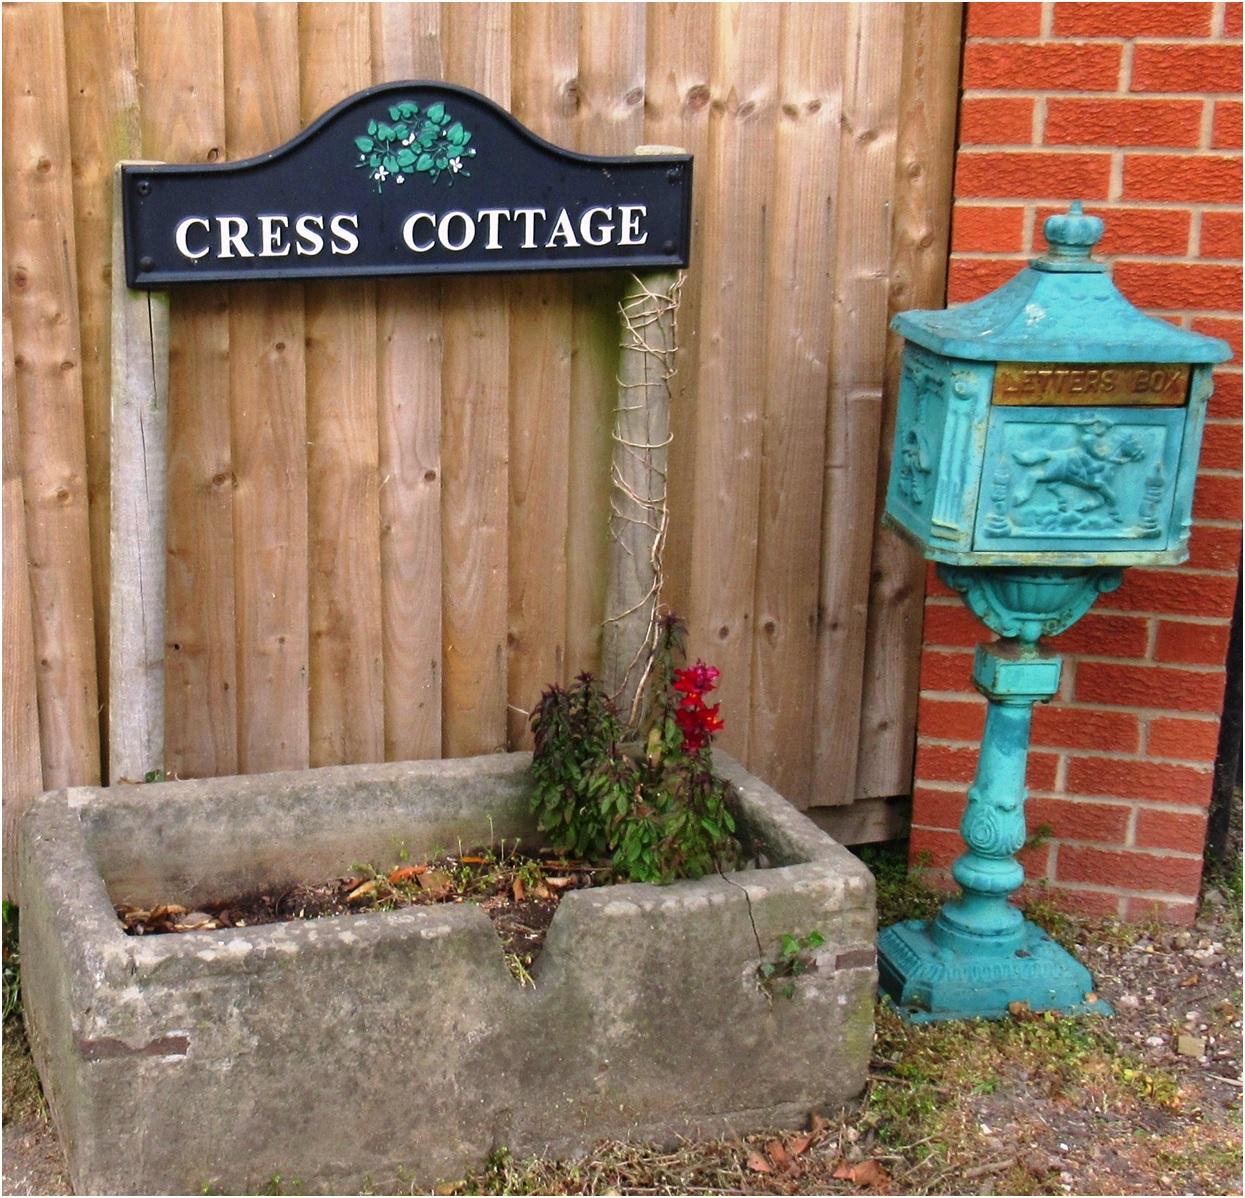 Cress Cottage